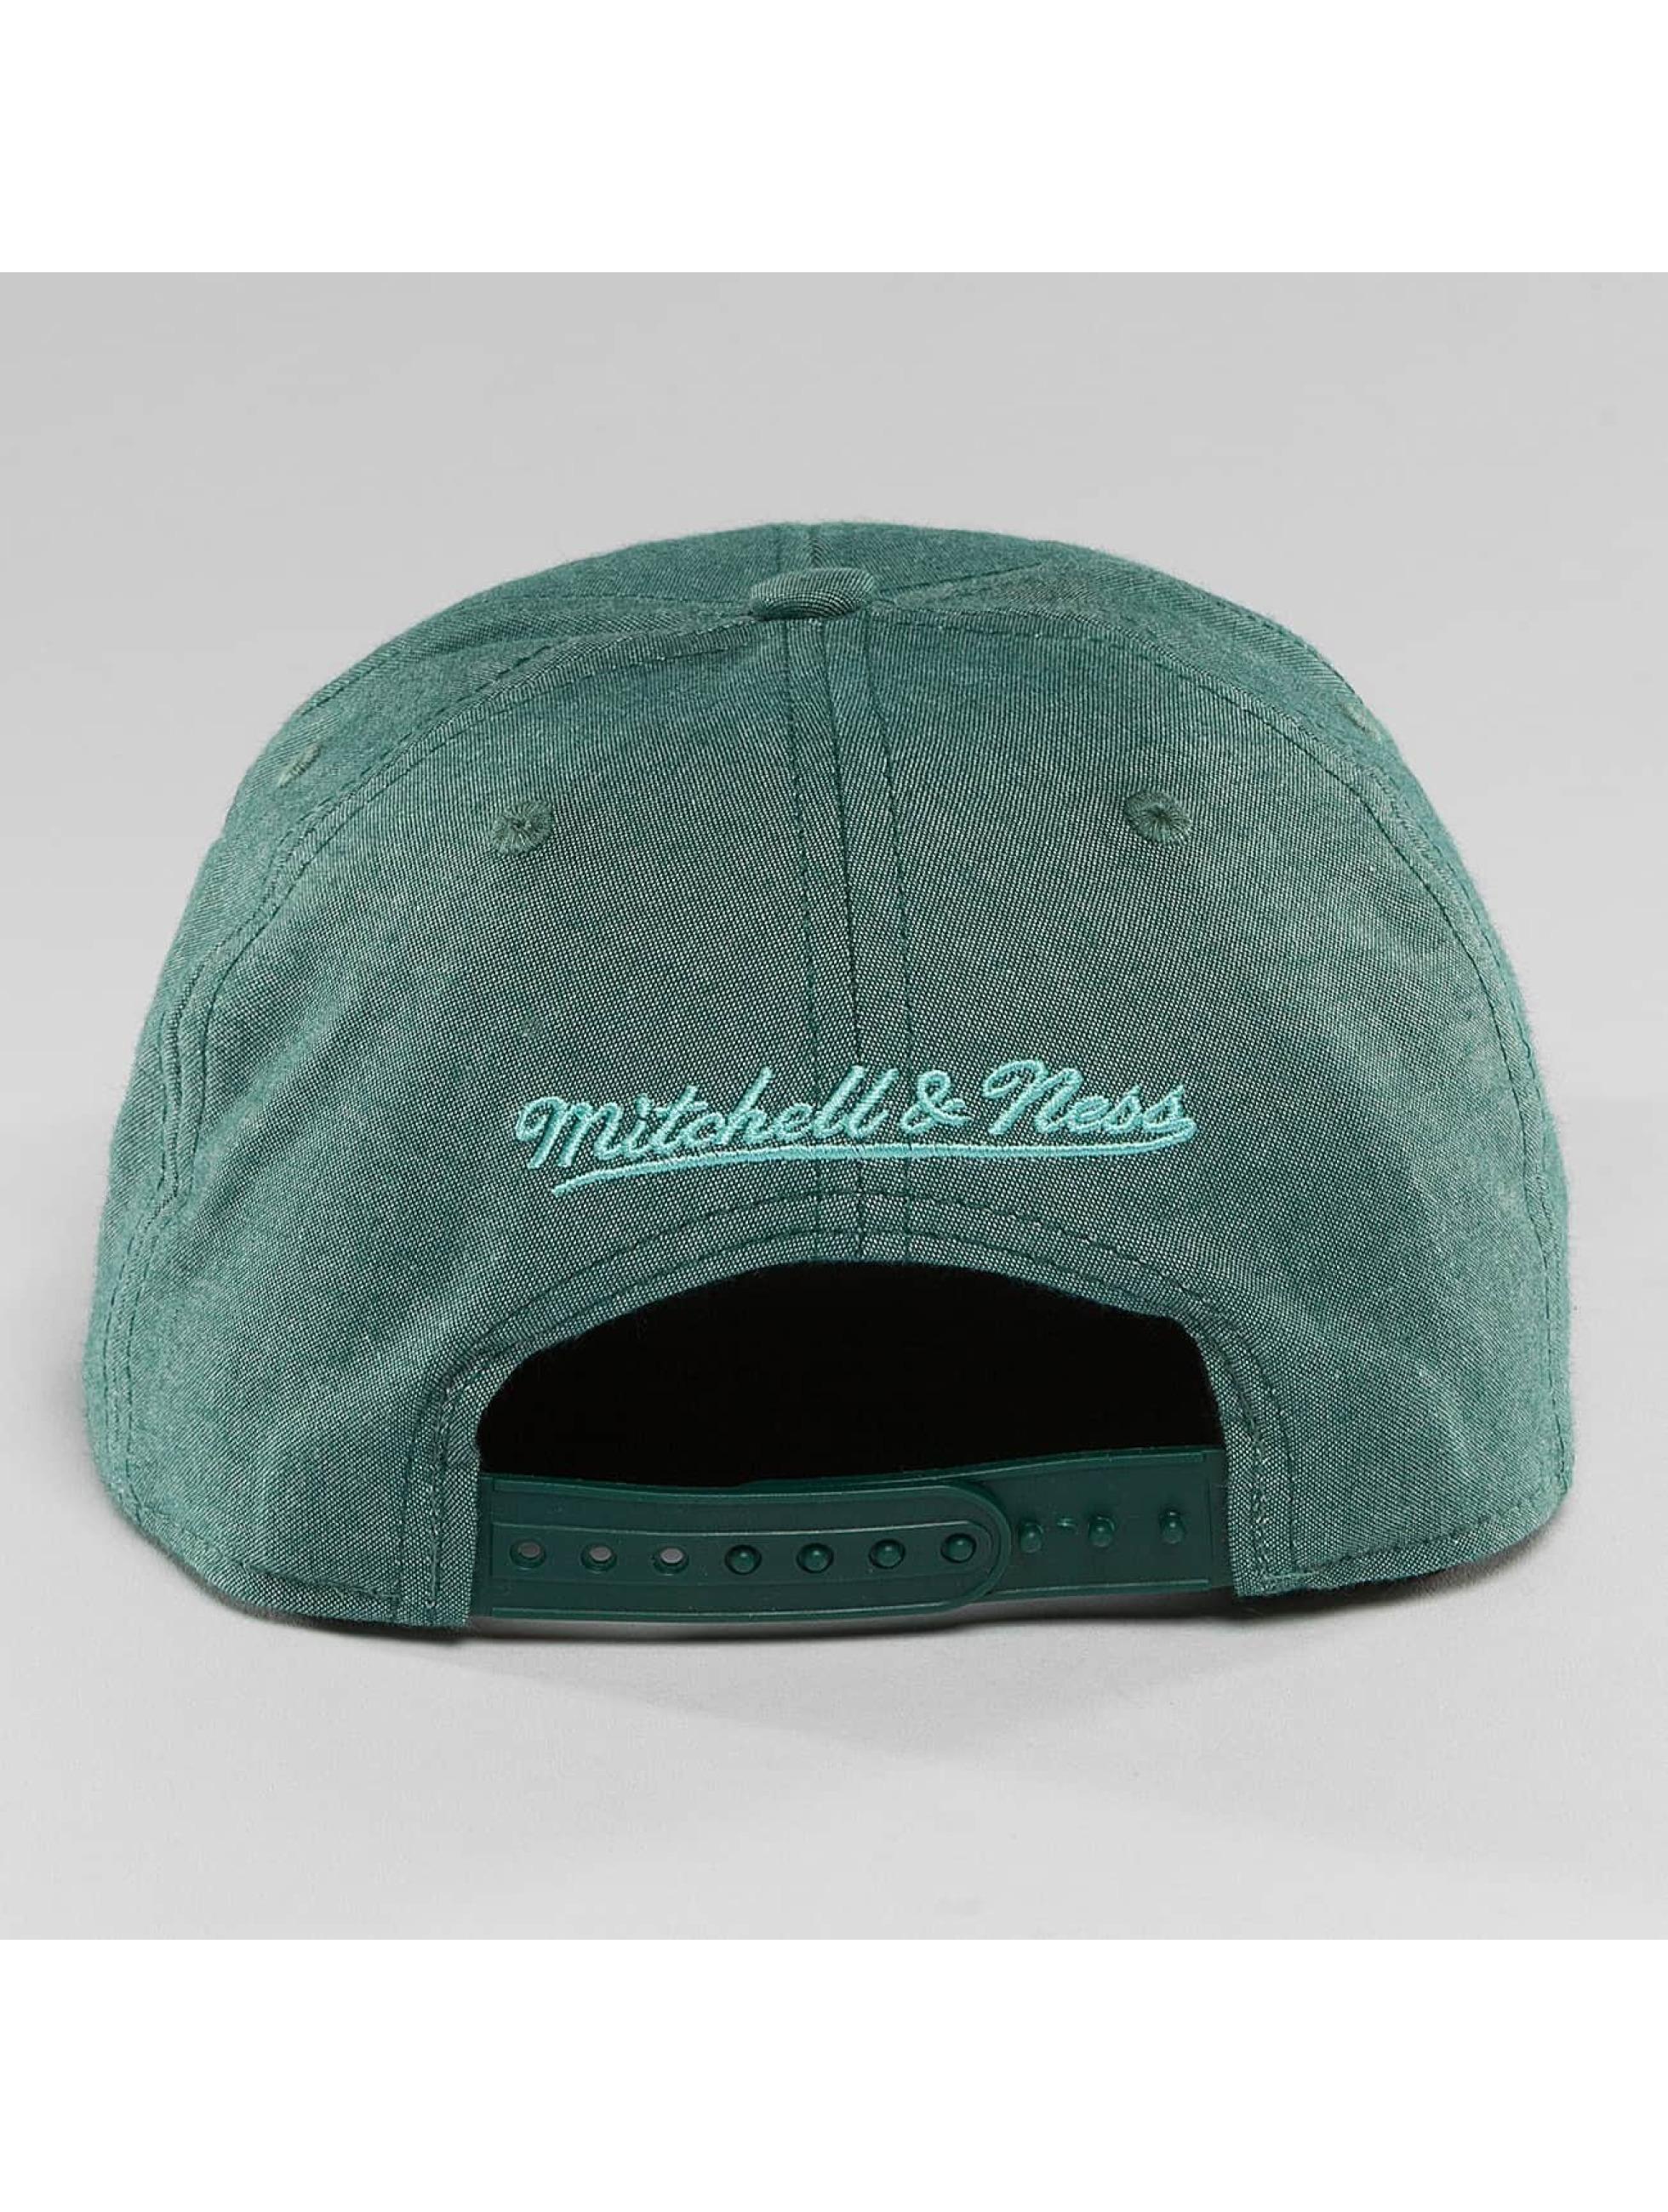 Mitchell & Ness Snapback Cap Italian Washed oliva